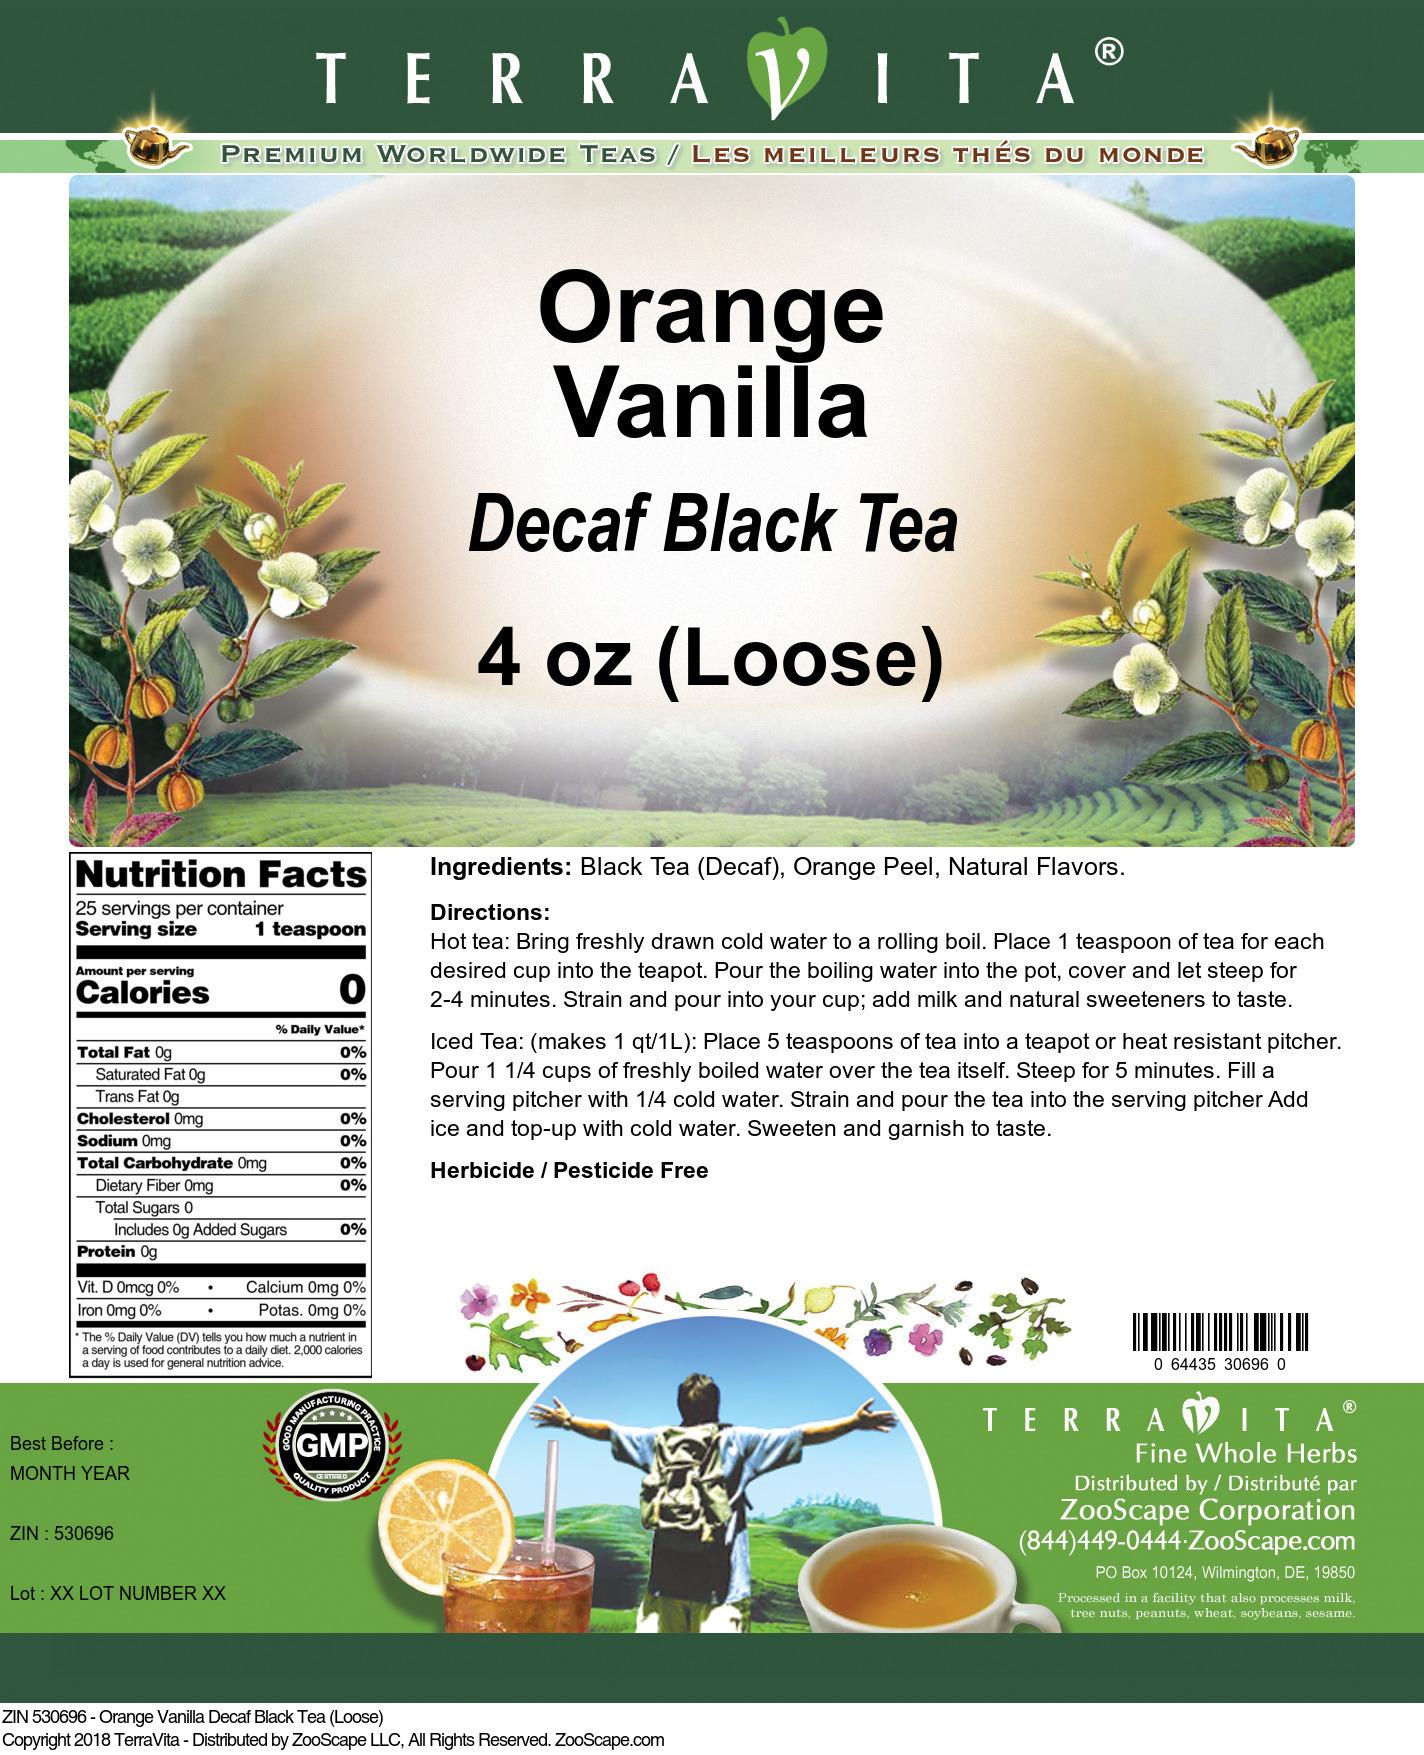 Orange Vanilla Decaf Black Tea